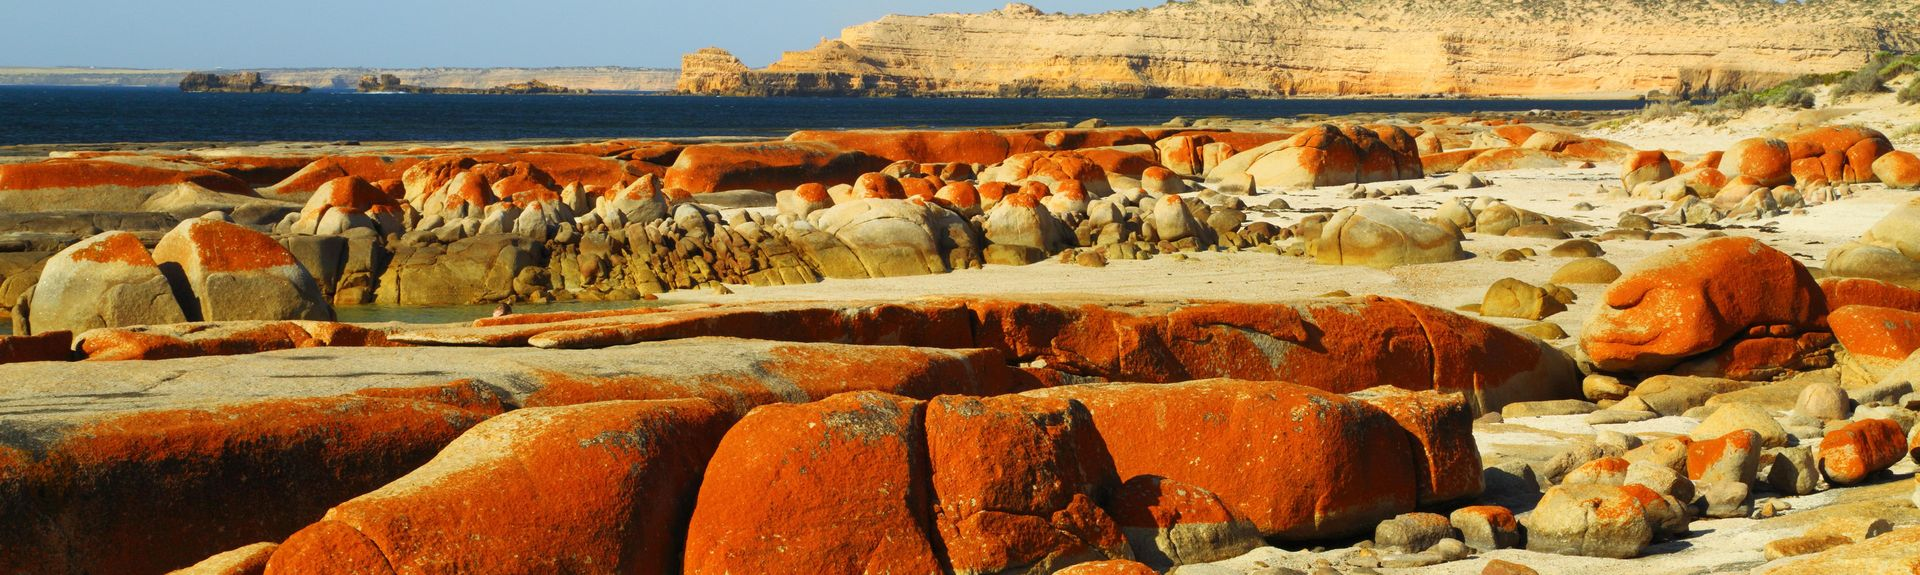 Streaky Bay, South Australia, Australia